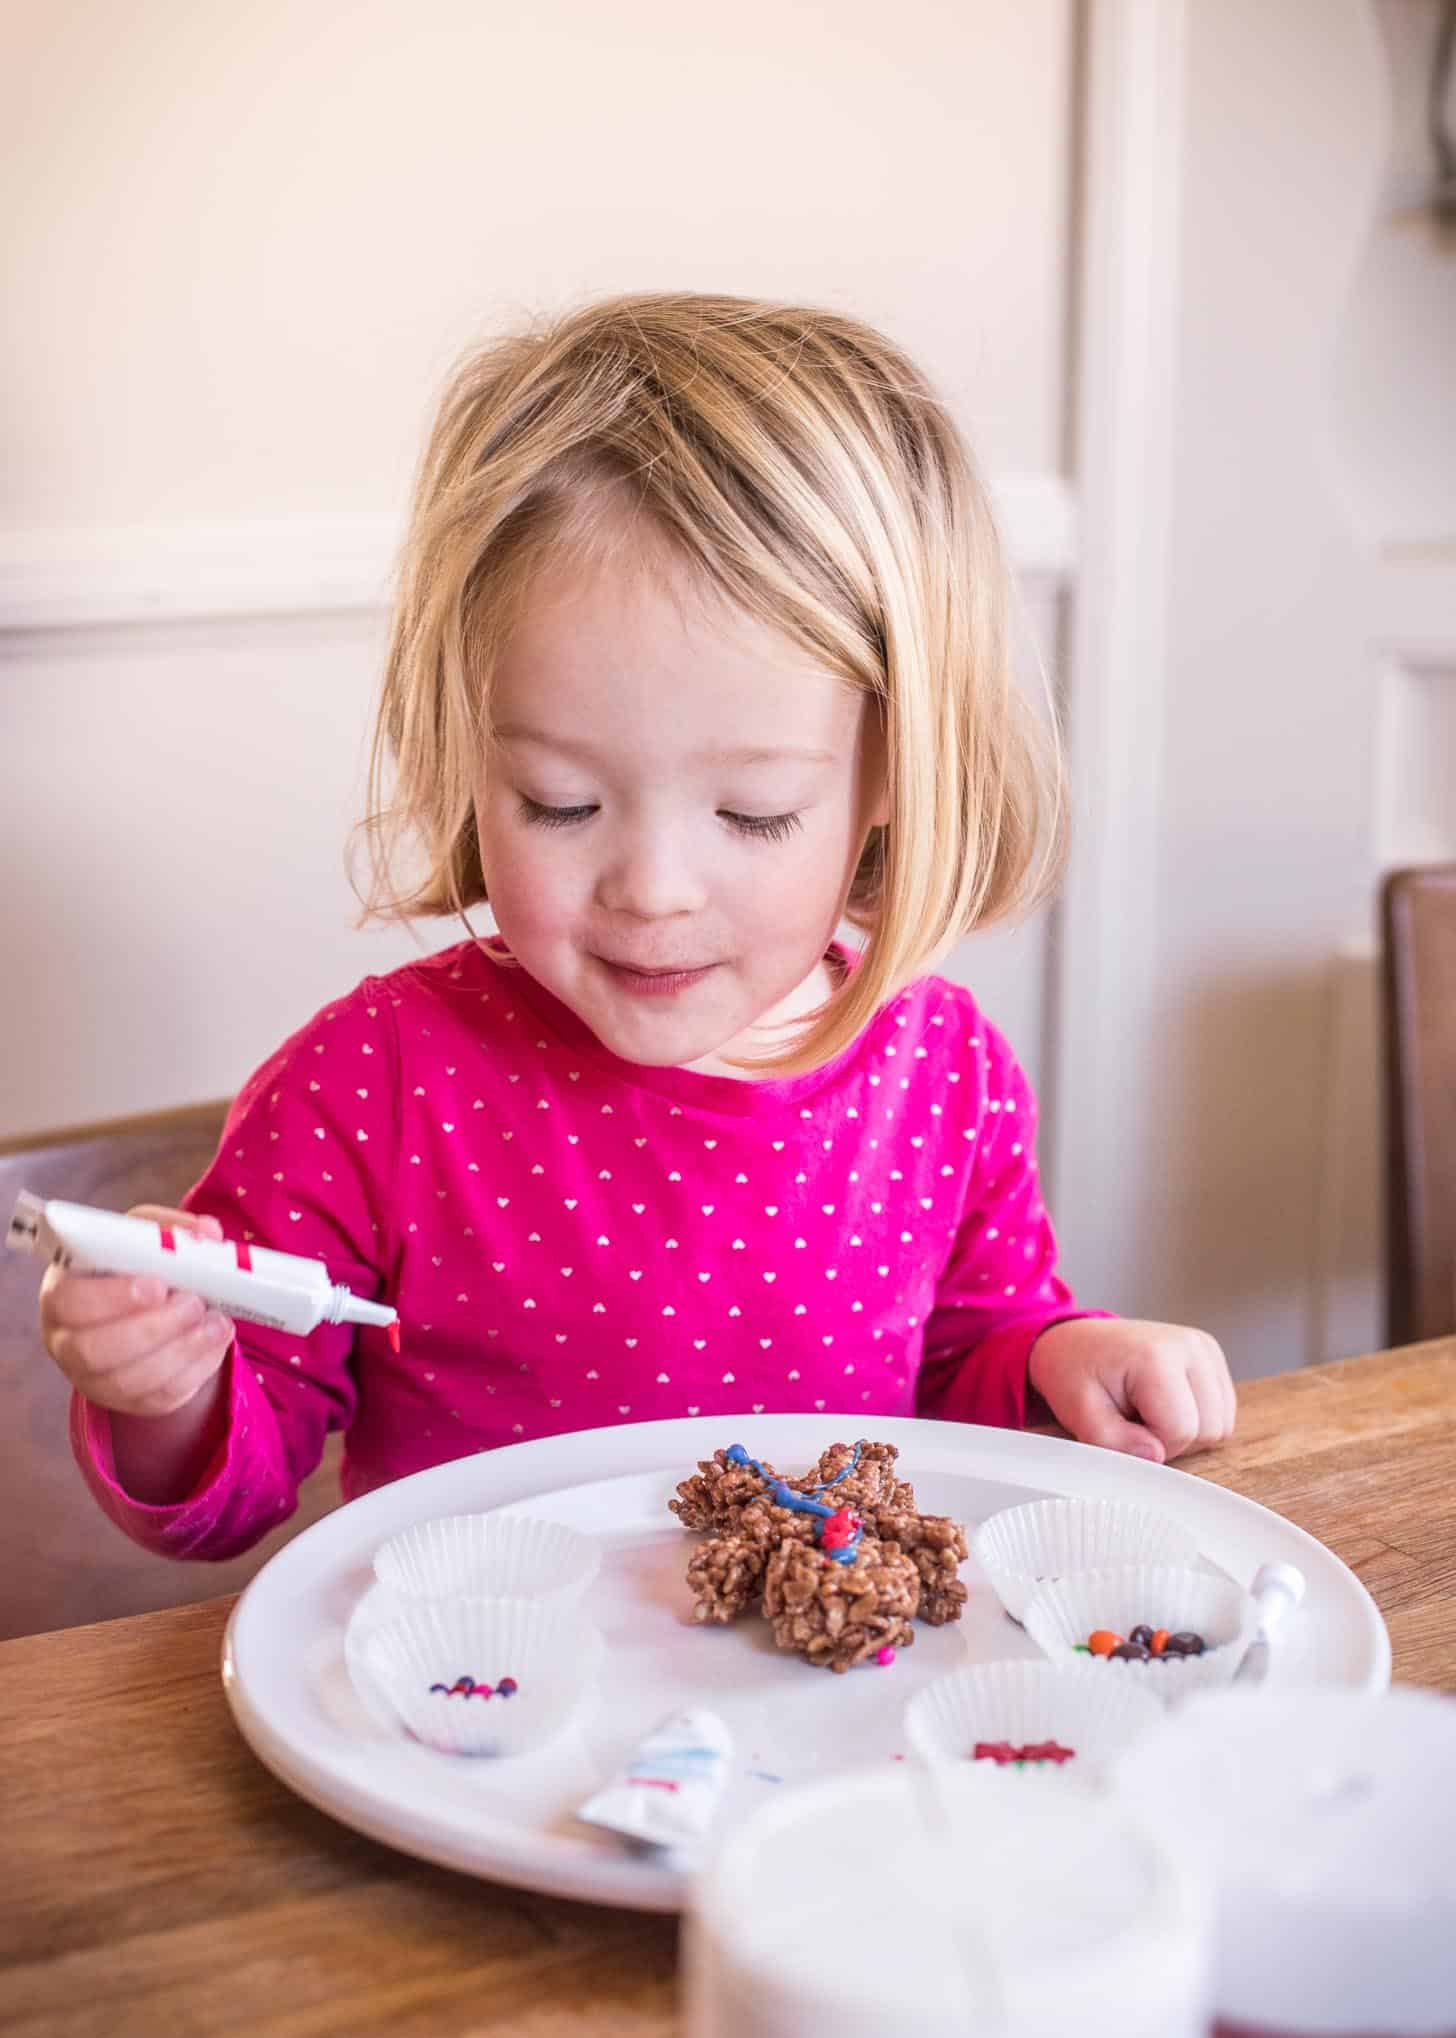 Molly decorating Chocolate Rice Krispies Treats Gingerbread Men